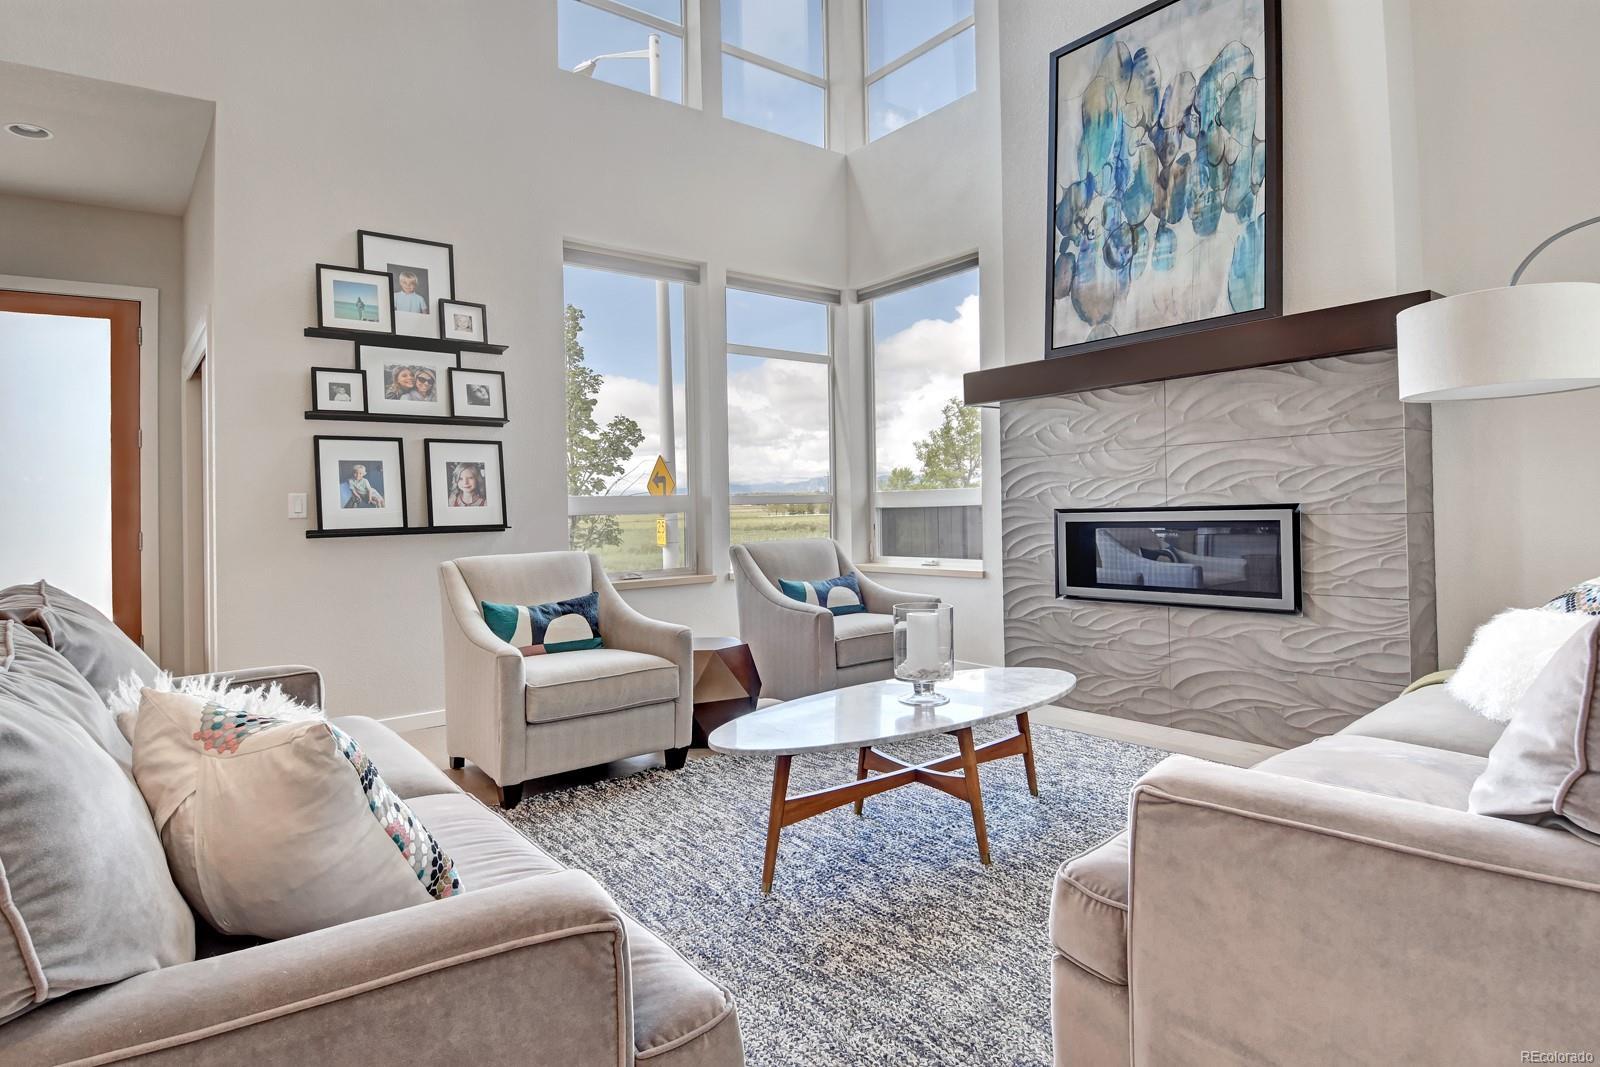 Custom Tile Fireplace & Sweeping Views